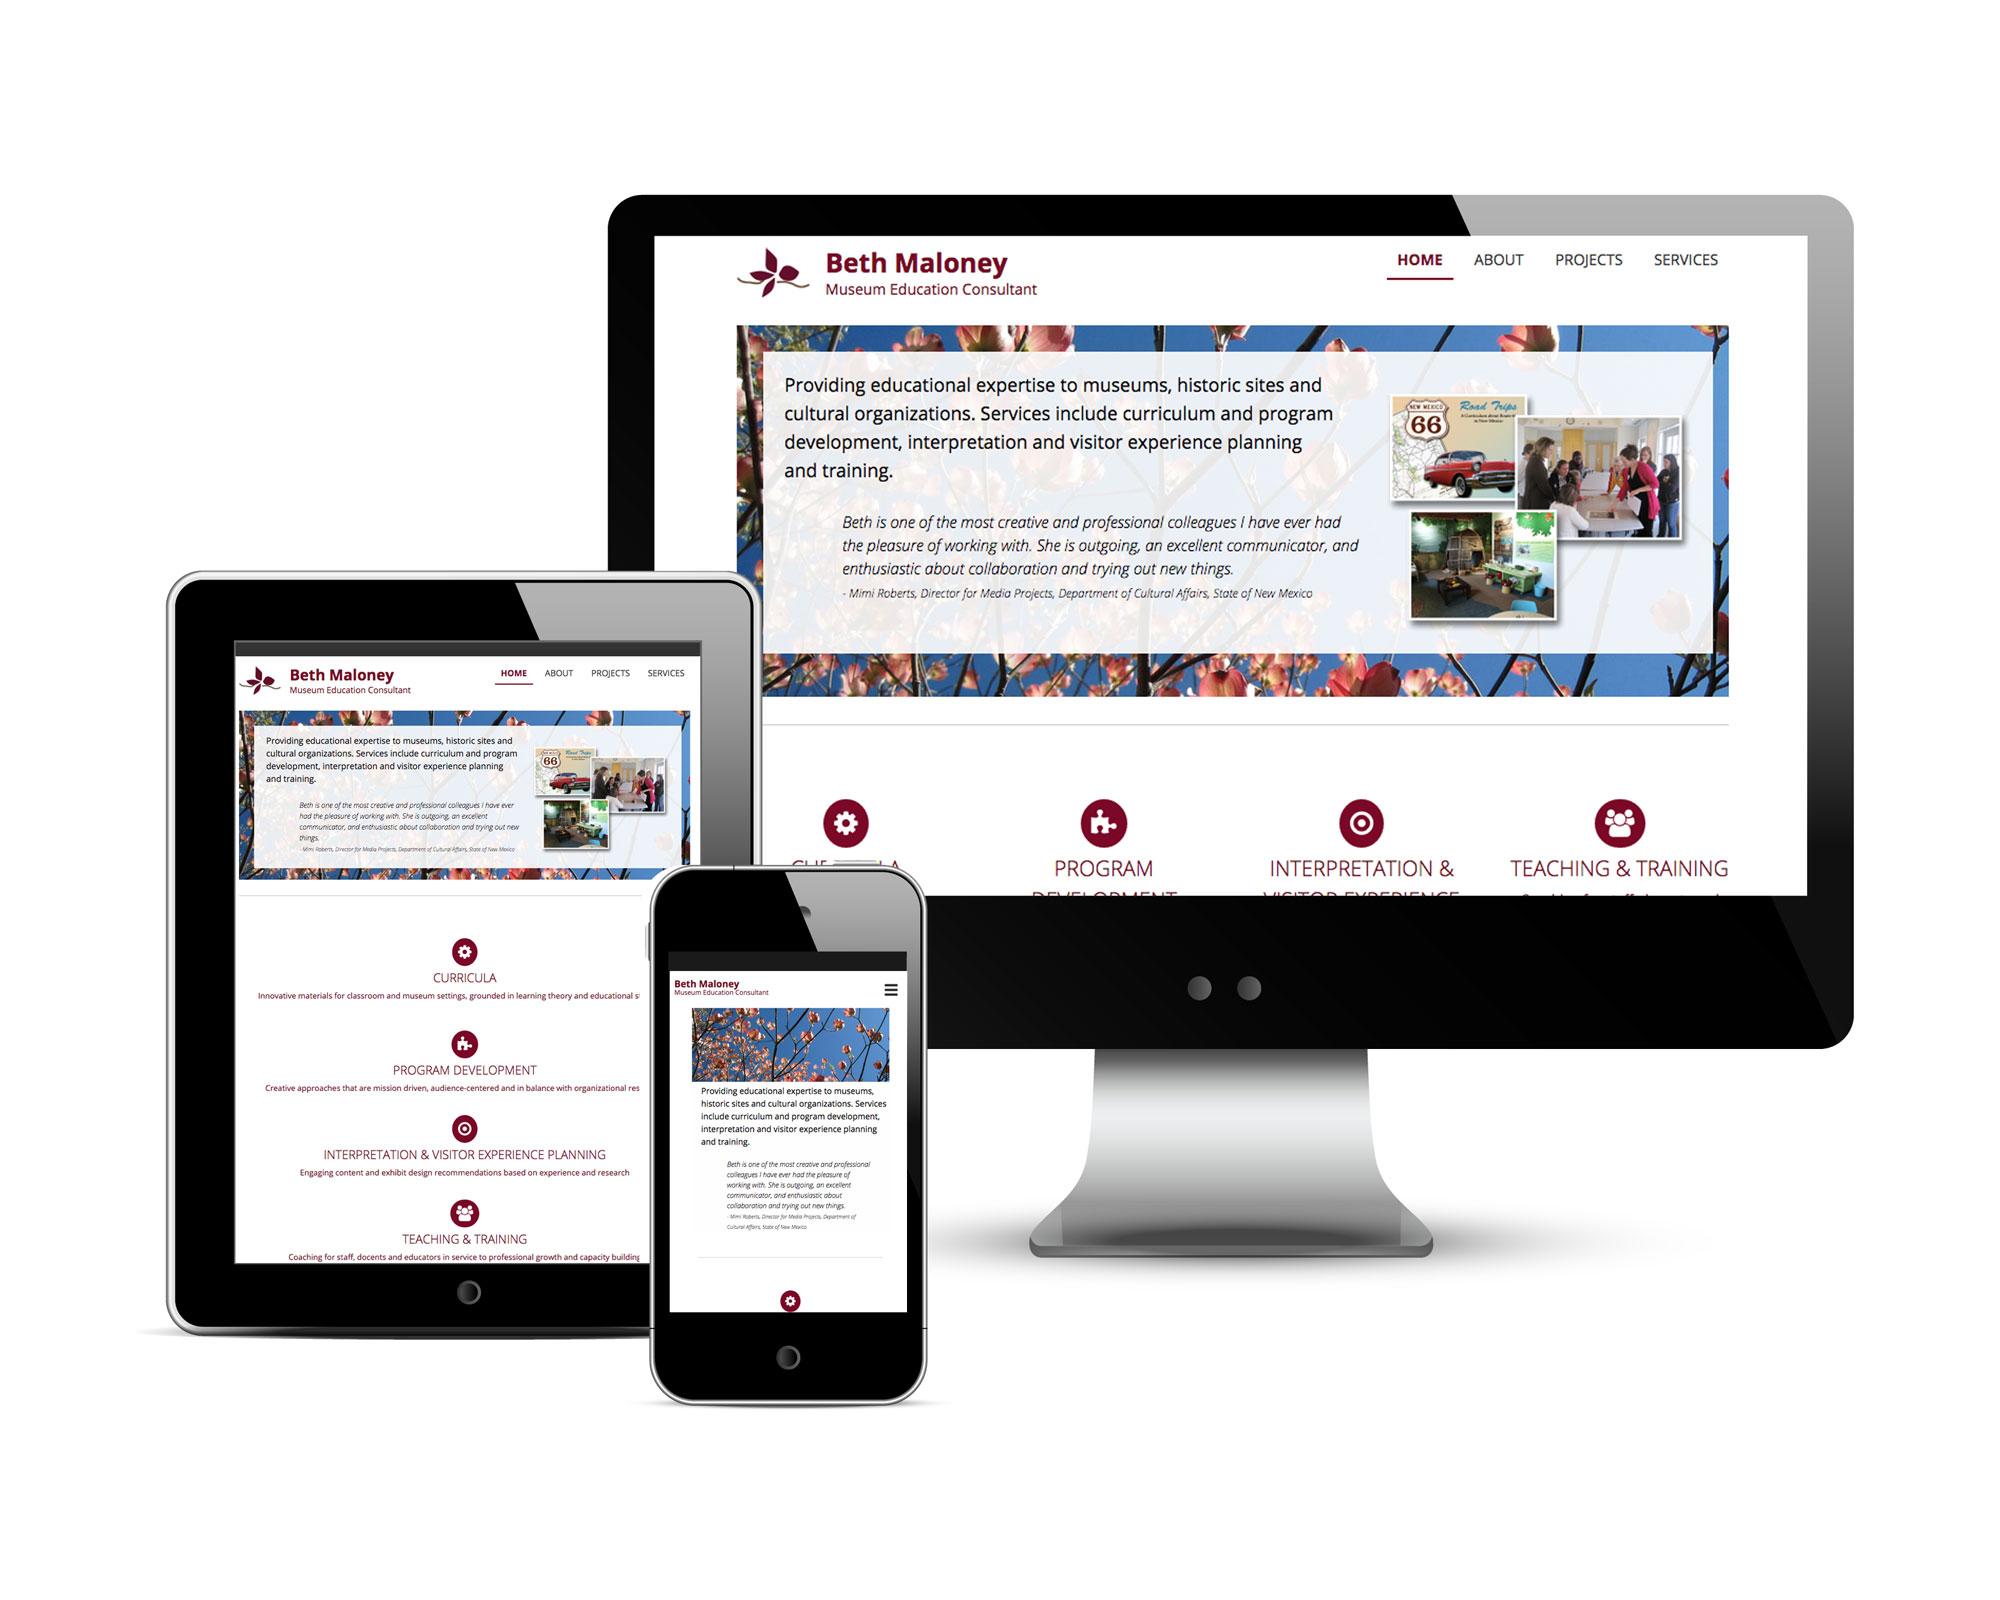 Beth Maloney's Website